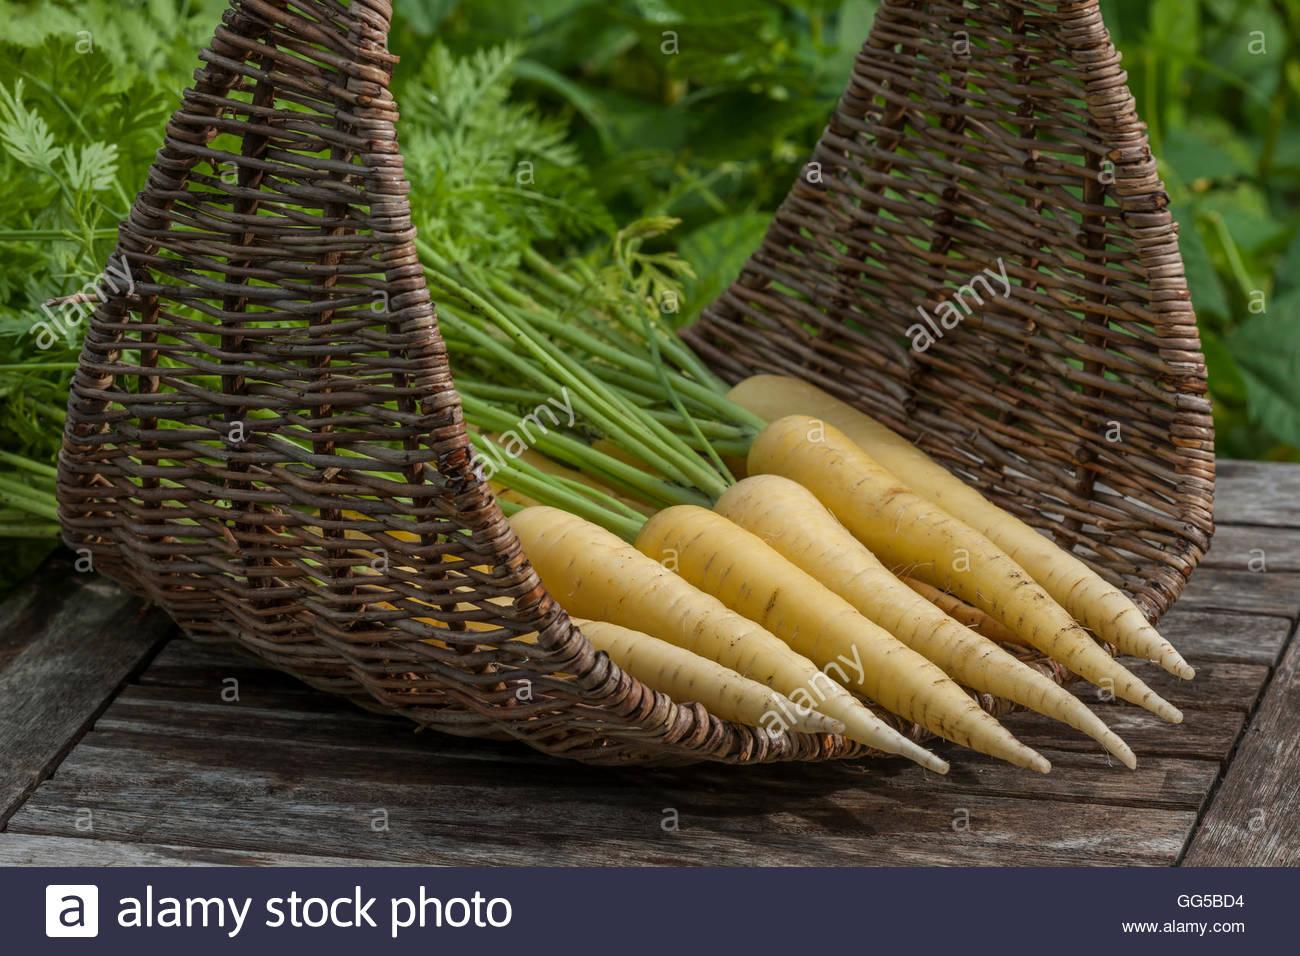 Carrot 'Creme de Lite' - Stock Image